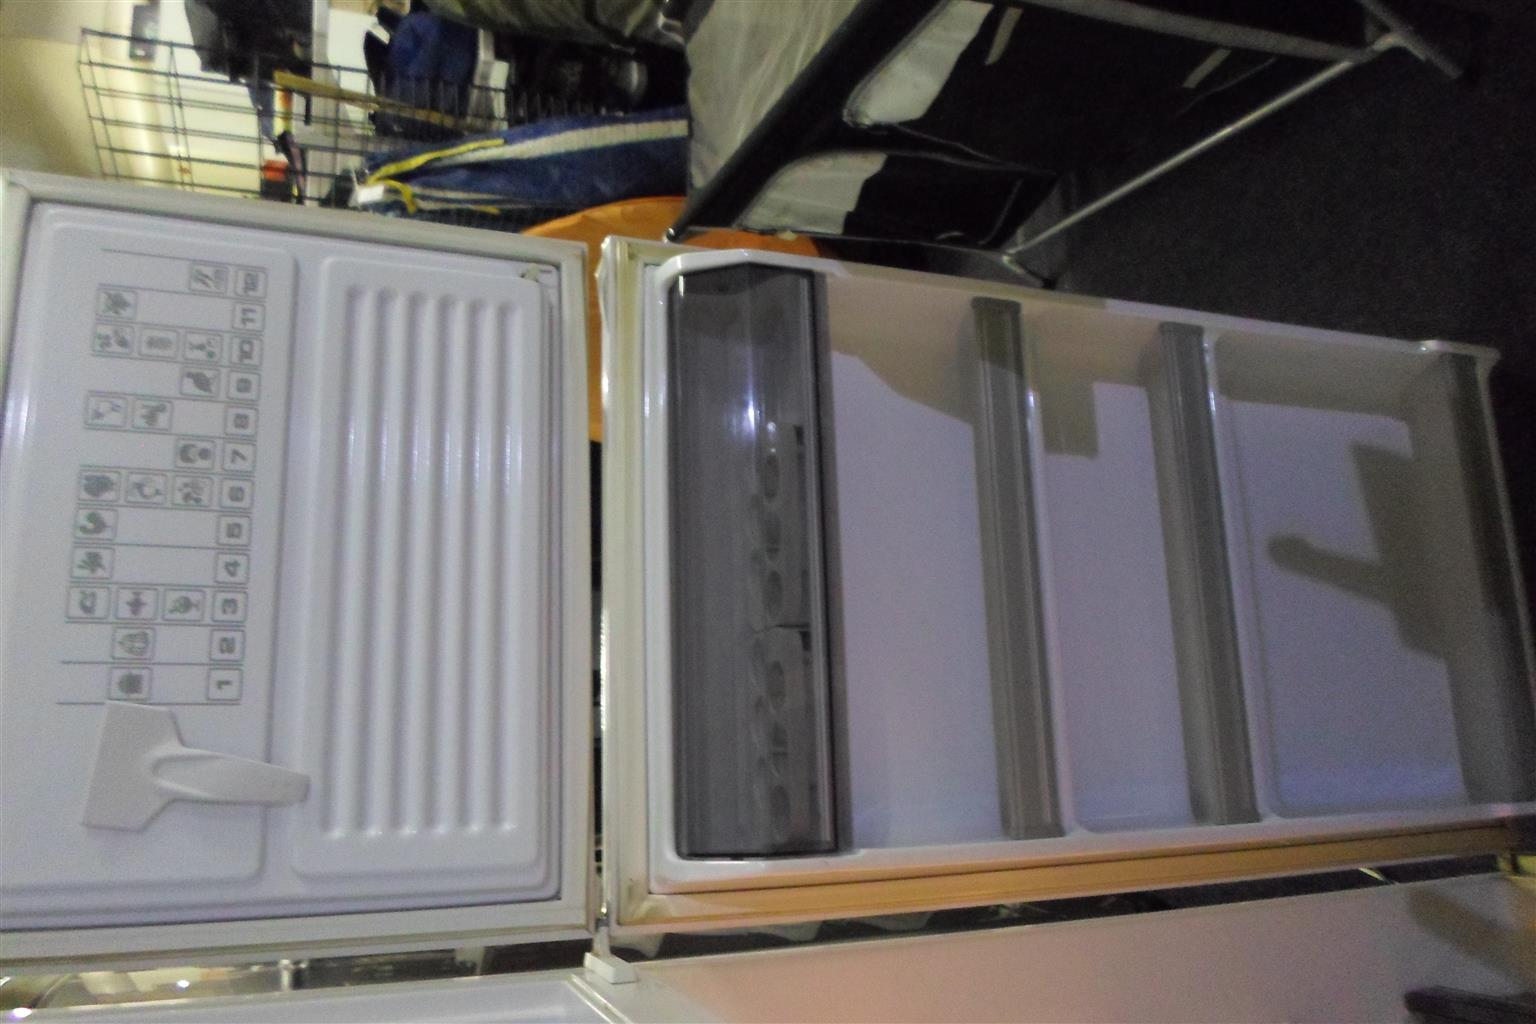 Kelvinator Fridge / Freezer - C033031397-1